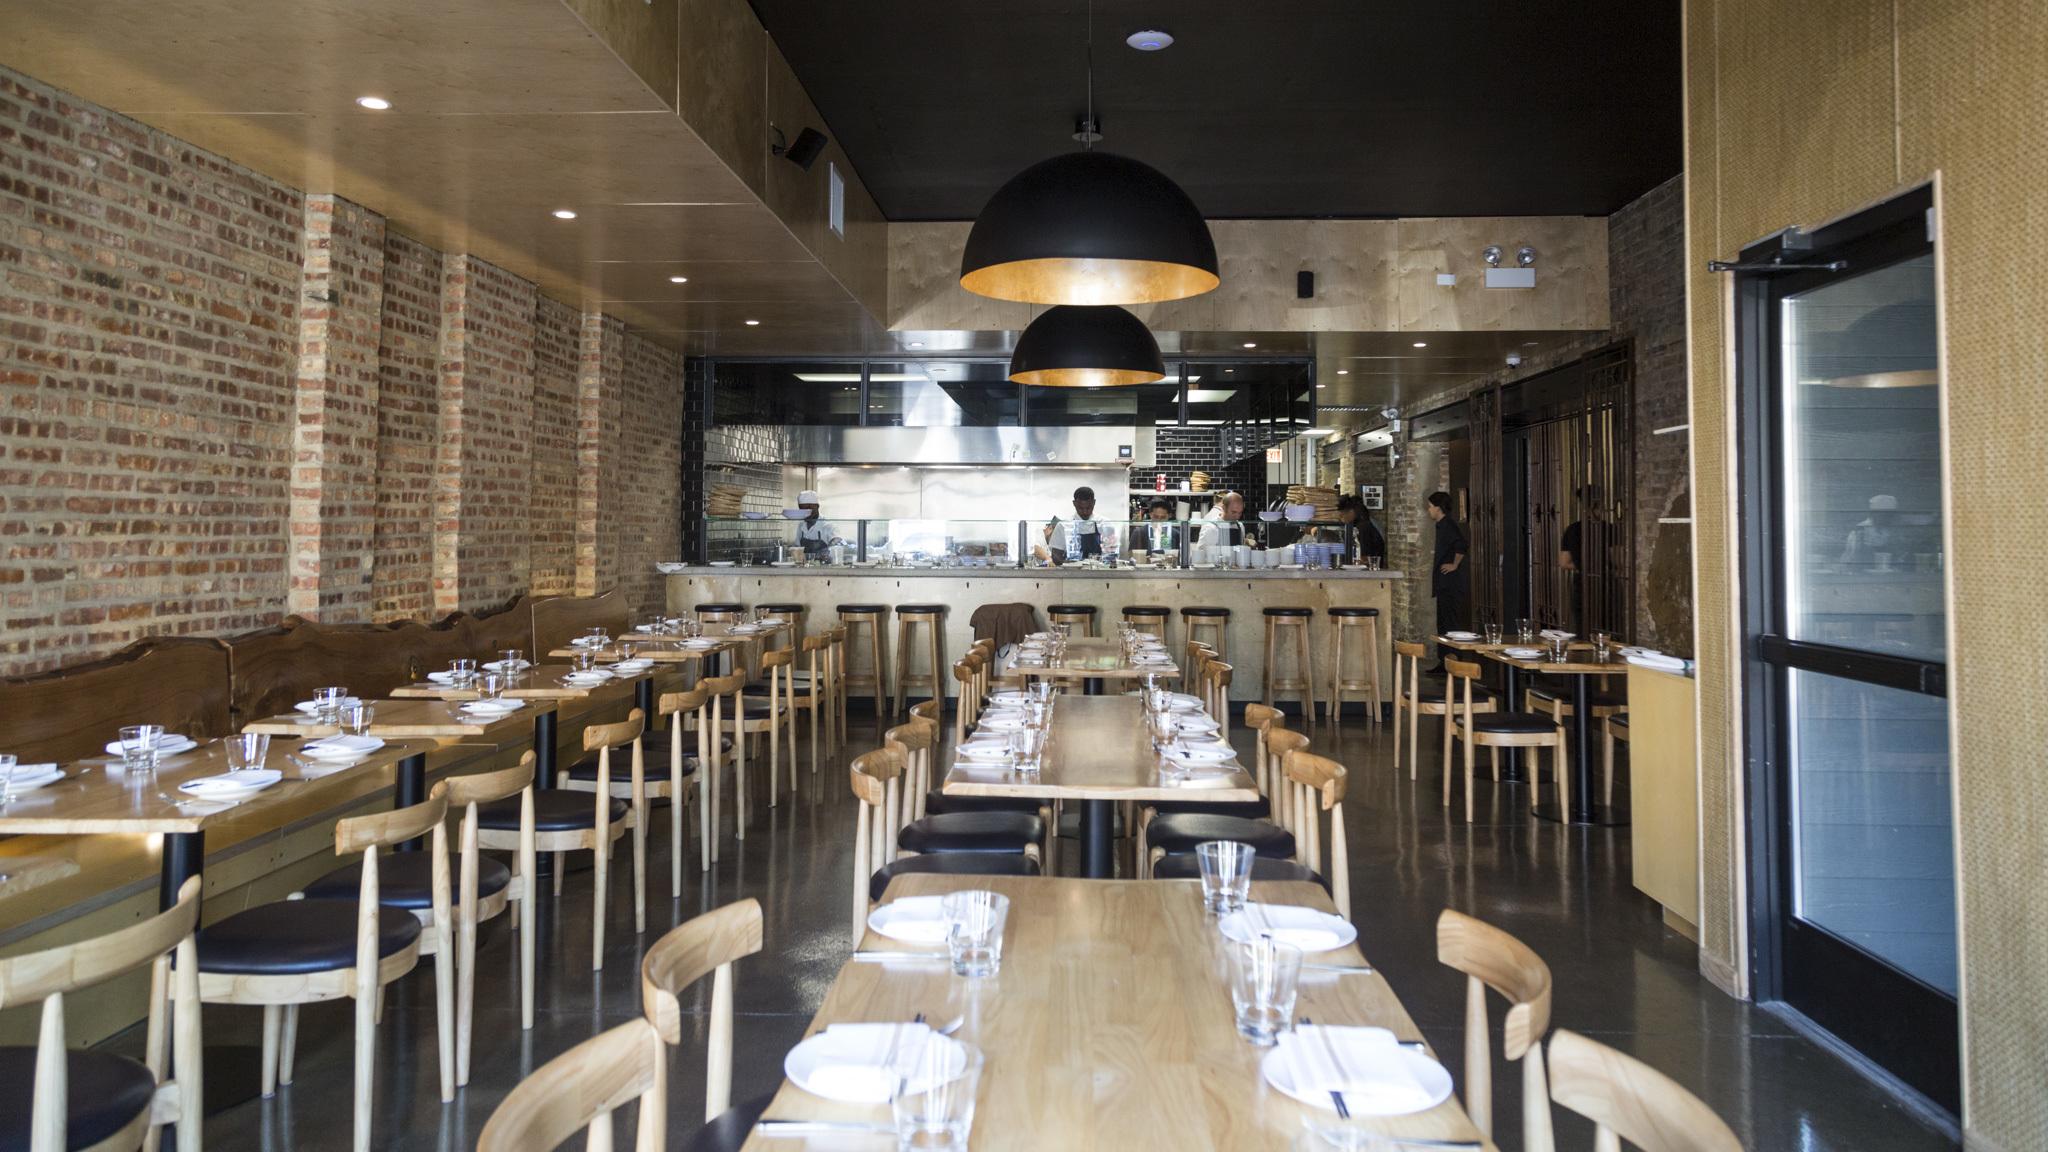 Restaurants react to Chicago's indoor dining ban